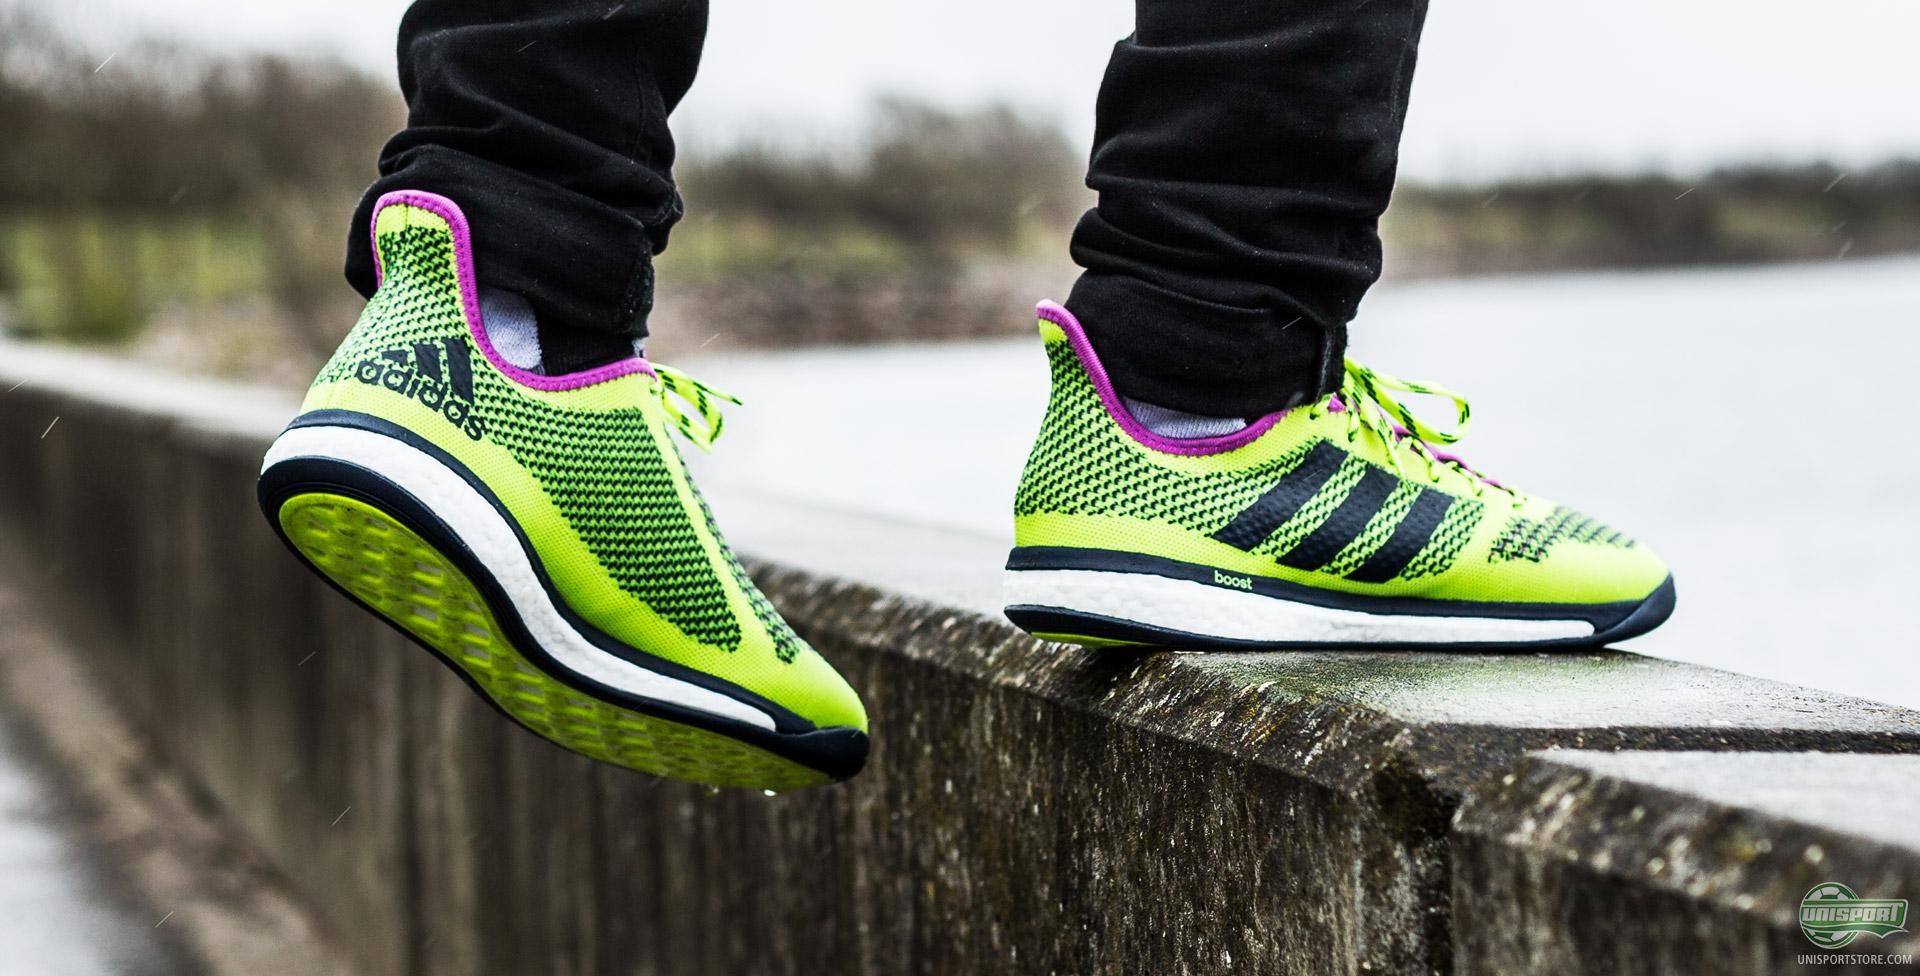 Adidas Primeknit 2.0